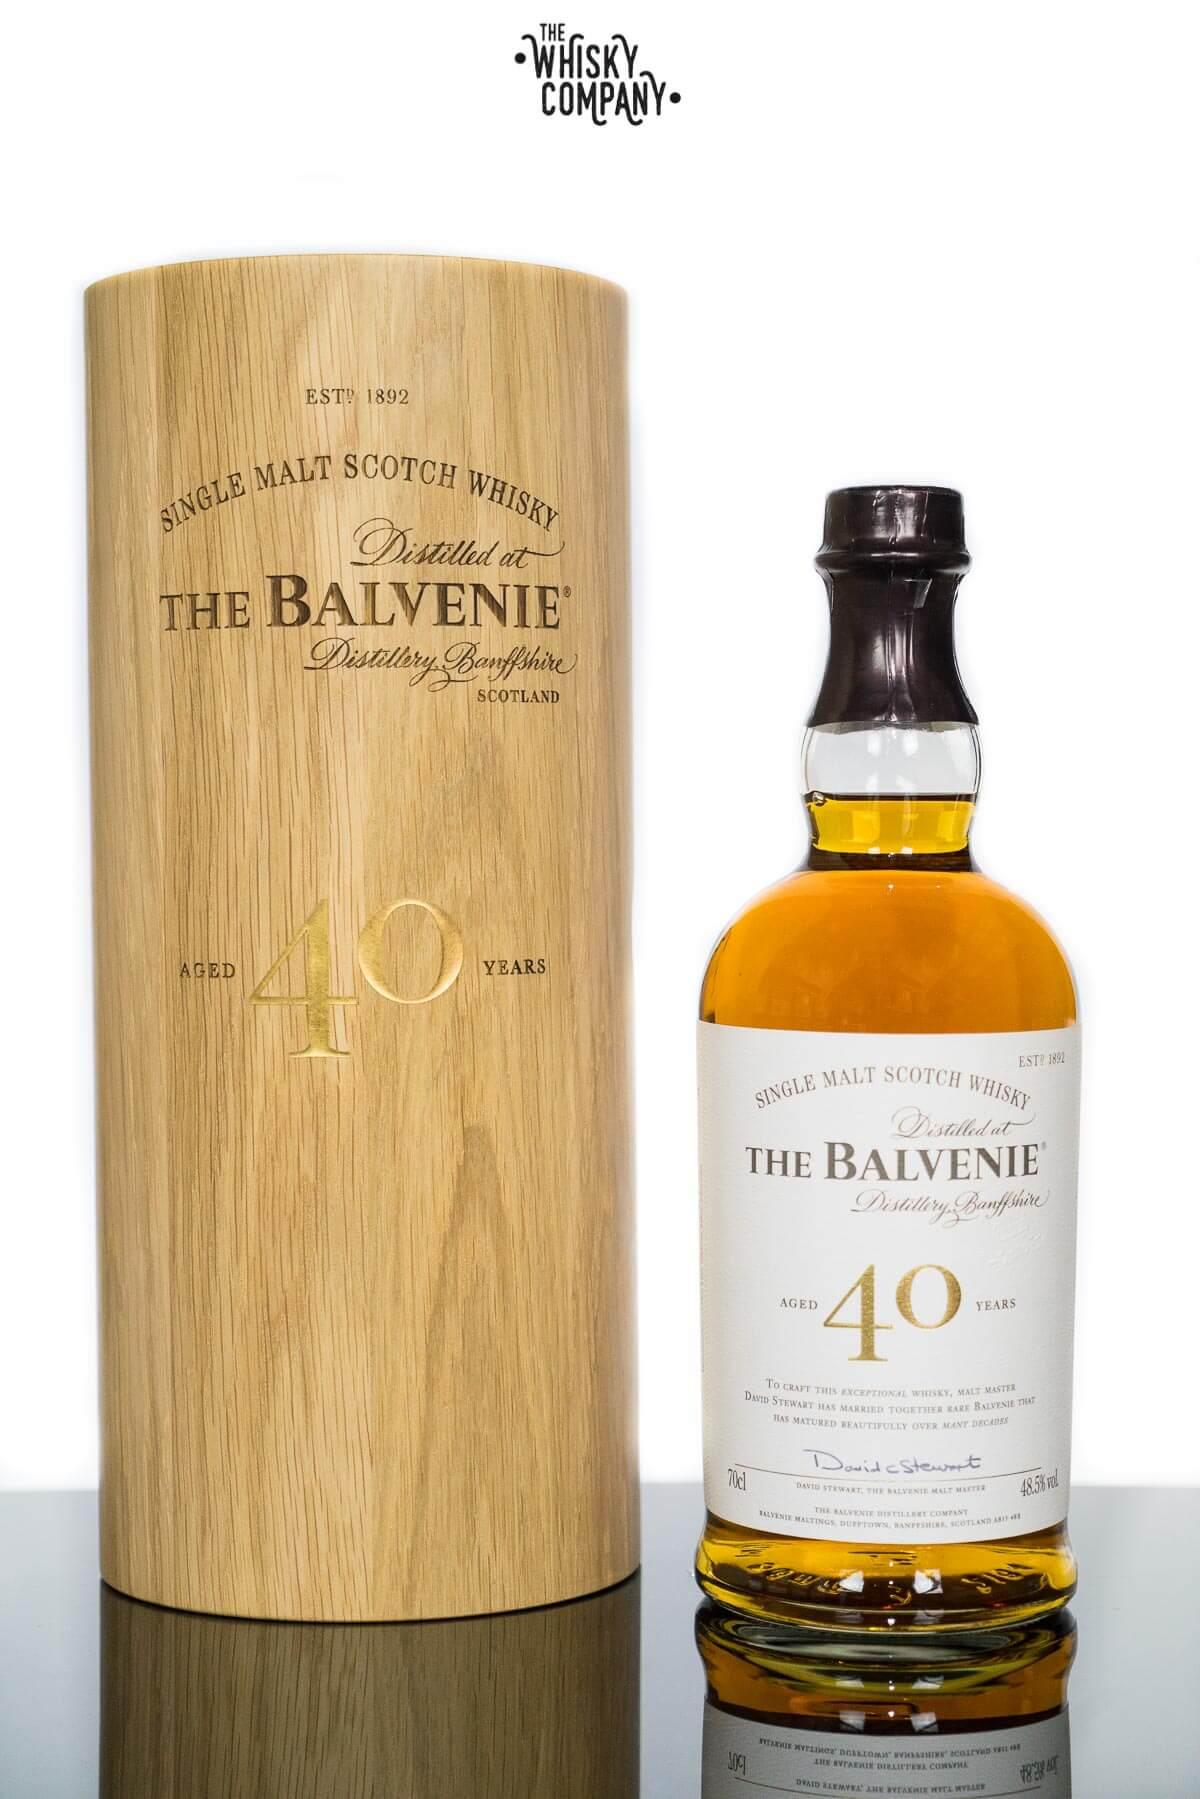 Balvenie single malt scotch whiskey